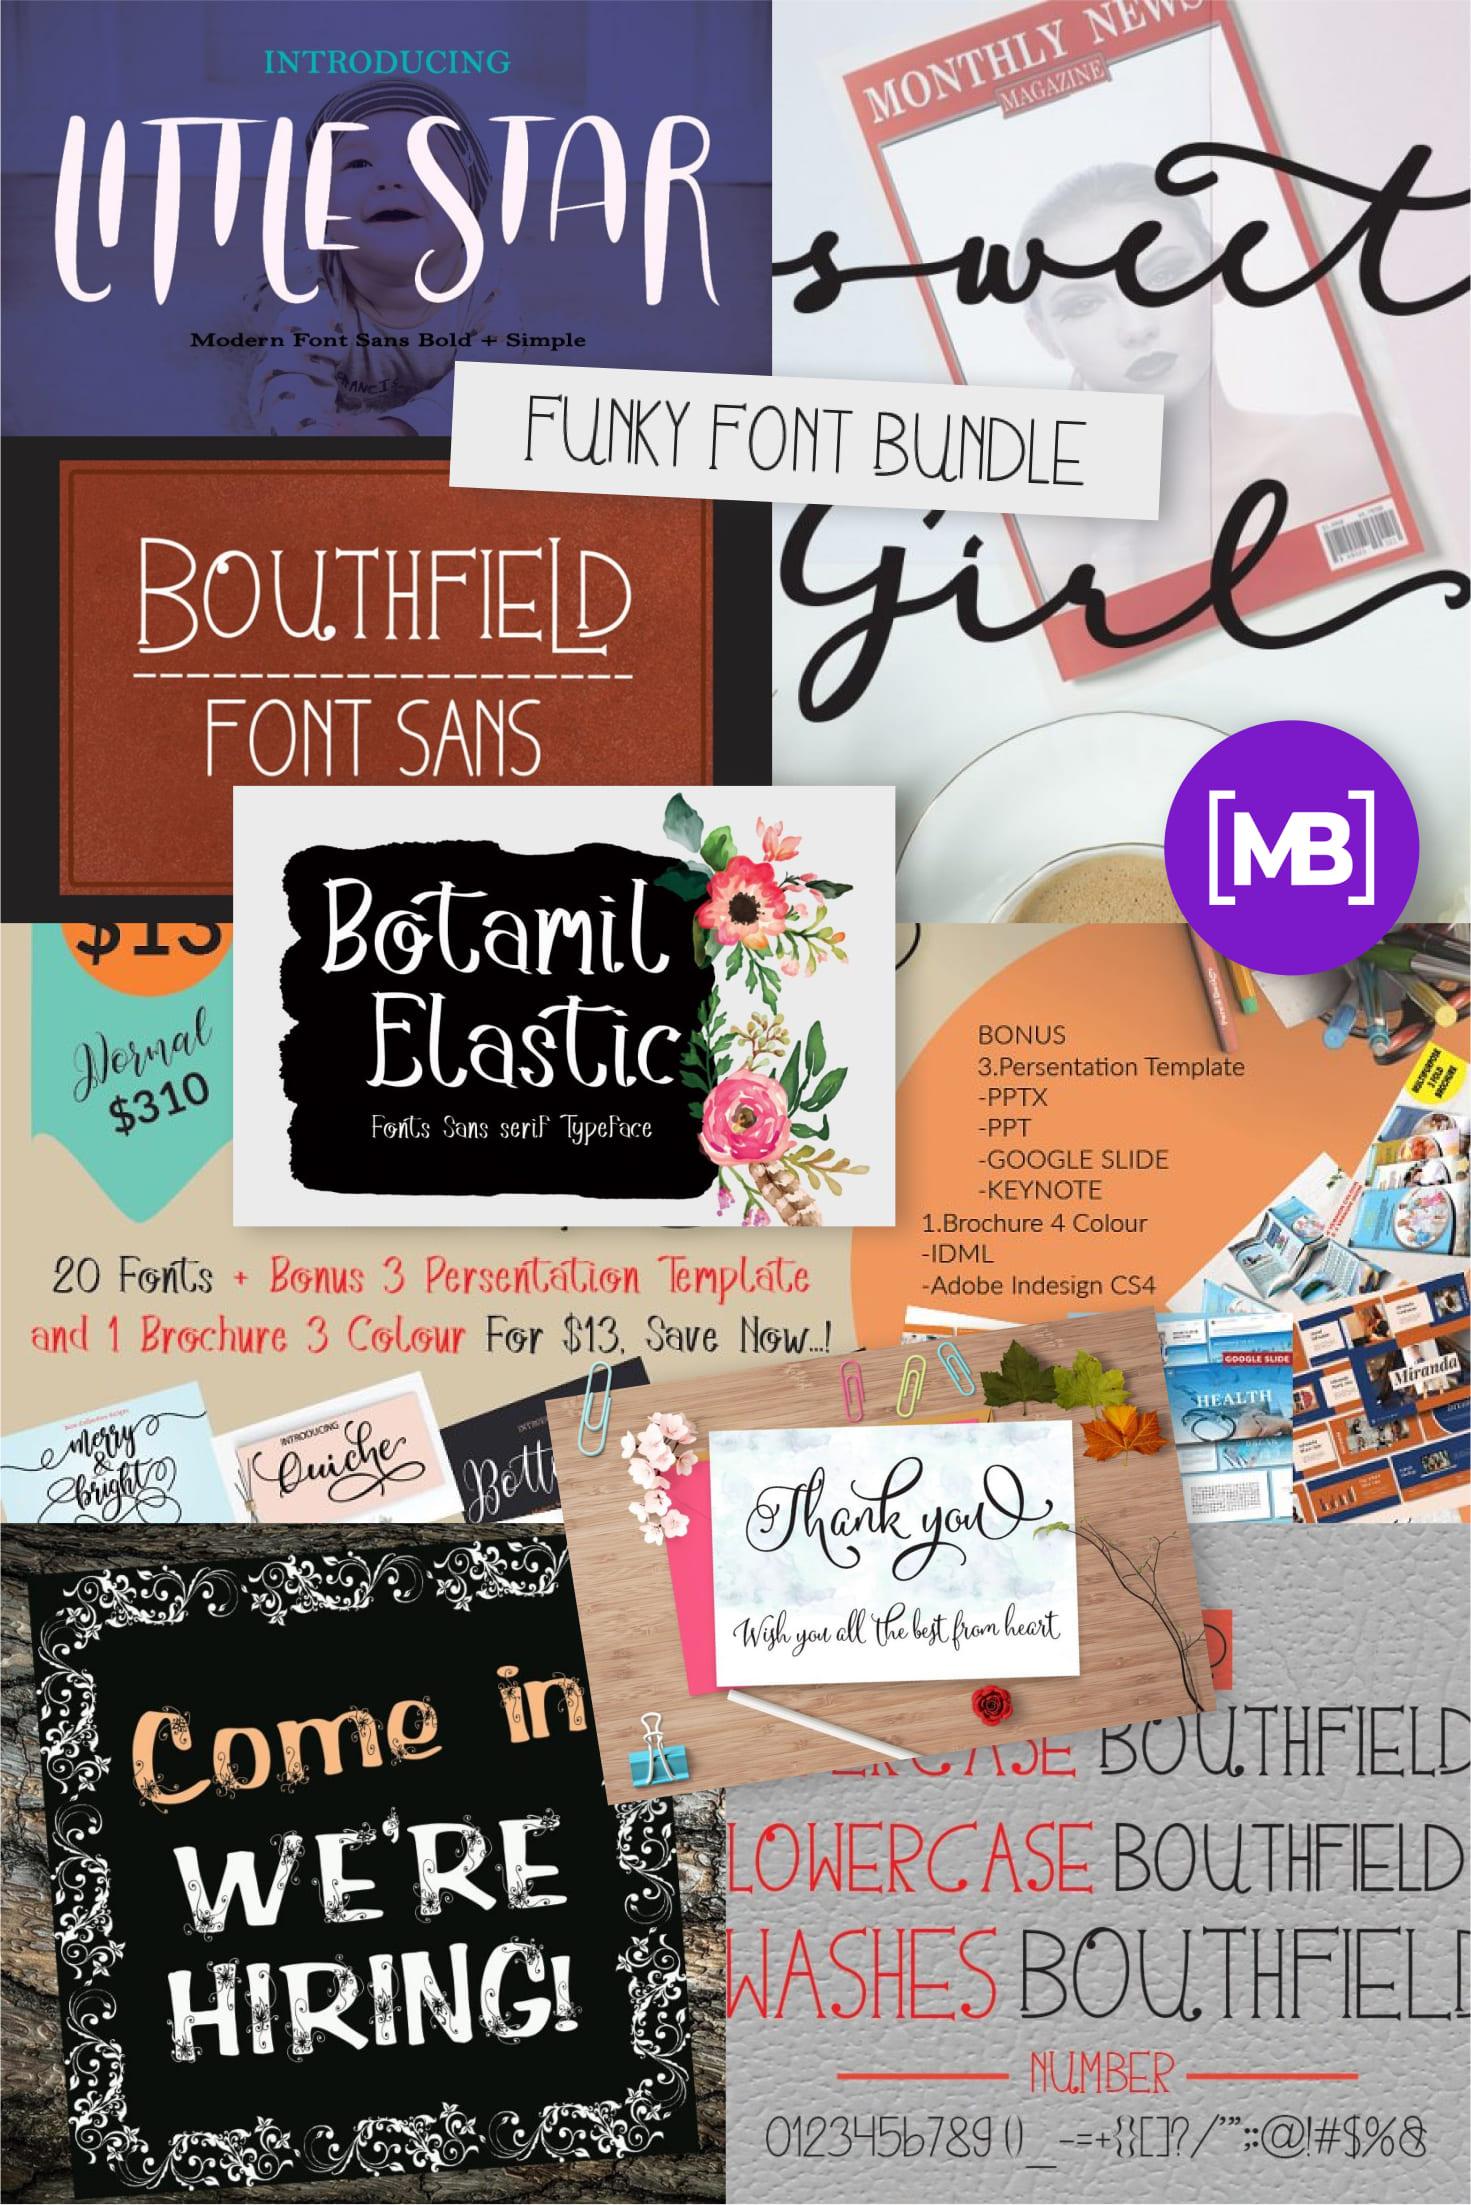 Pinterest Image: Funky Font Bundle: 18 Amazing Modern Calligraphy Fonts.